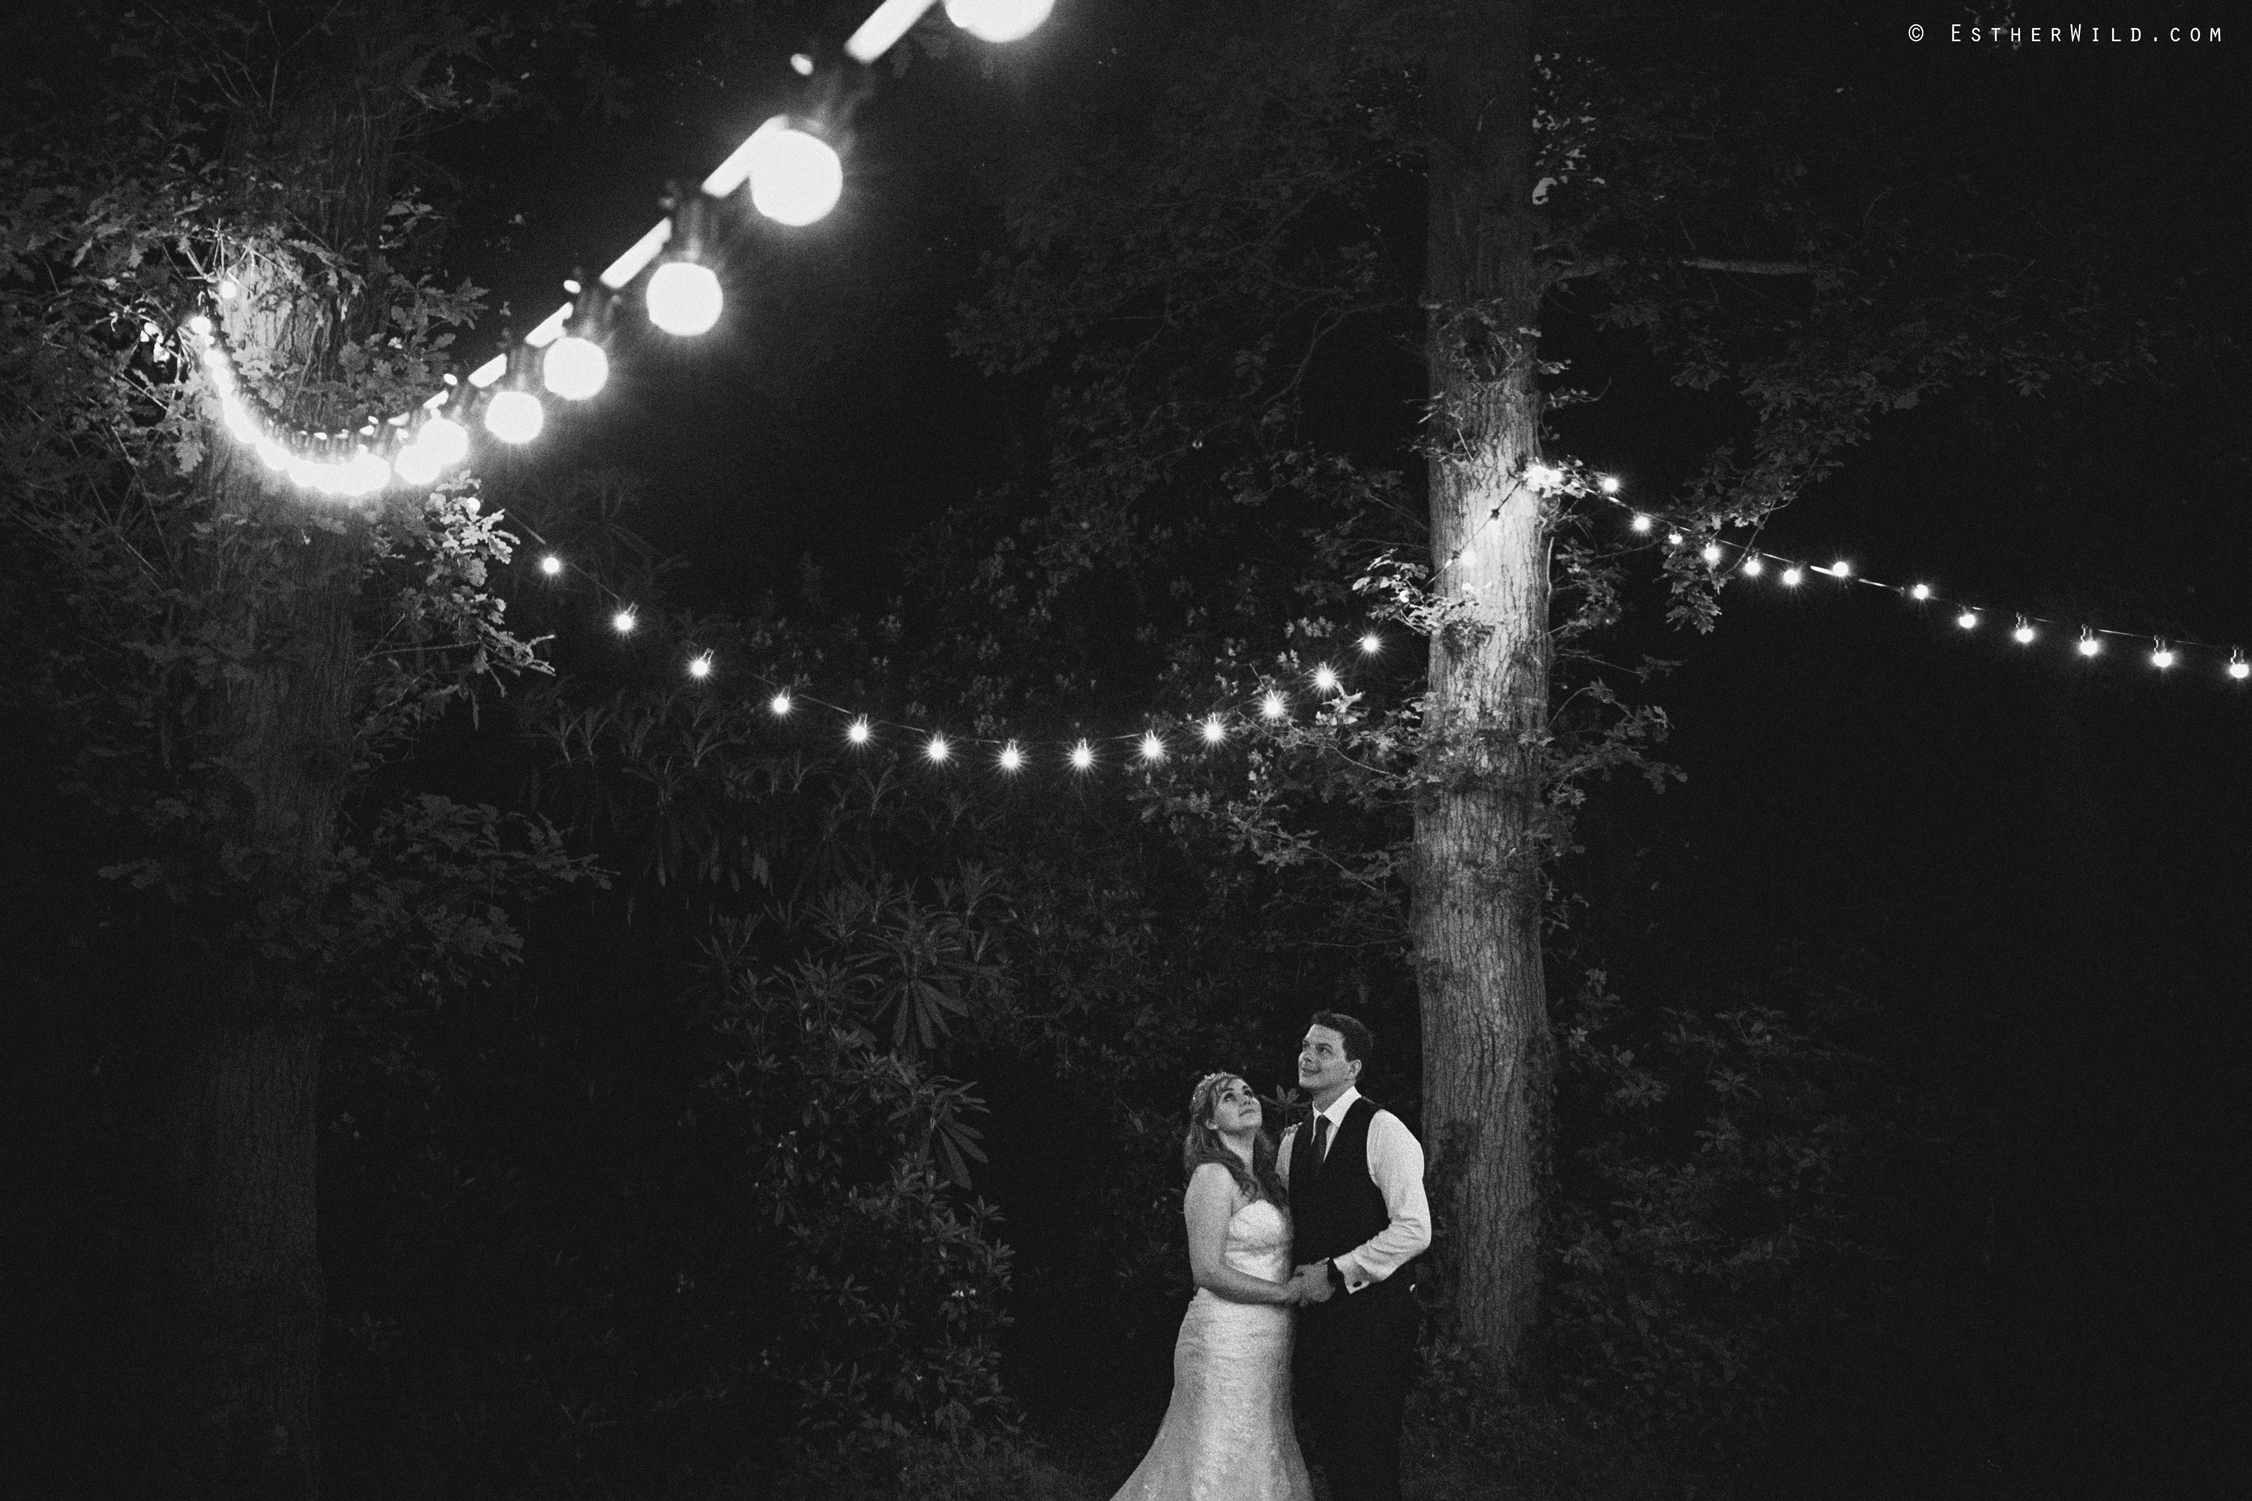 Norfolk_Wedding_Photographer_Mannington_Hall_Country_Esther_Wild_2990-1.jpg